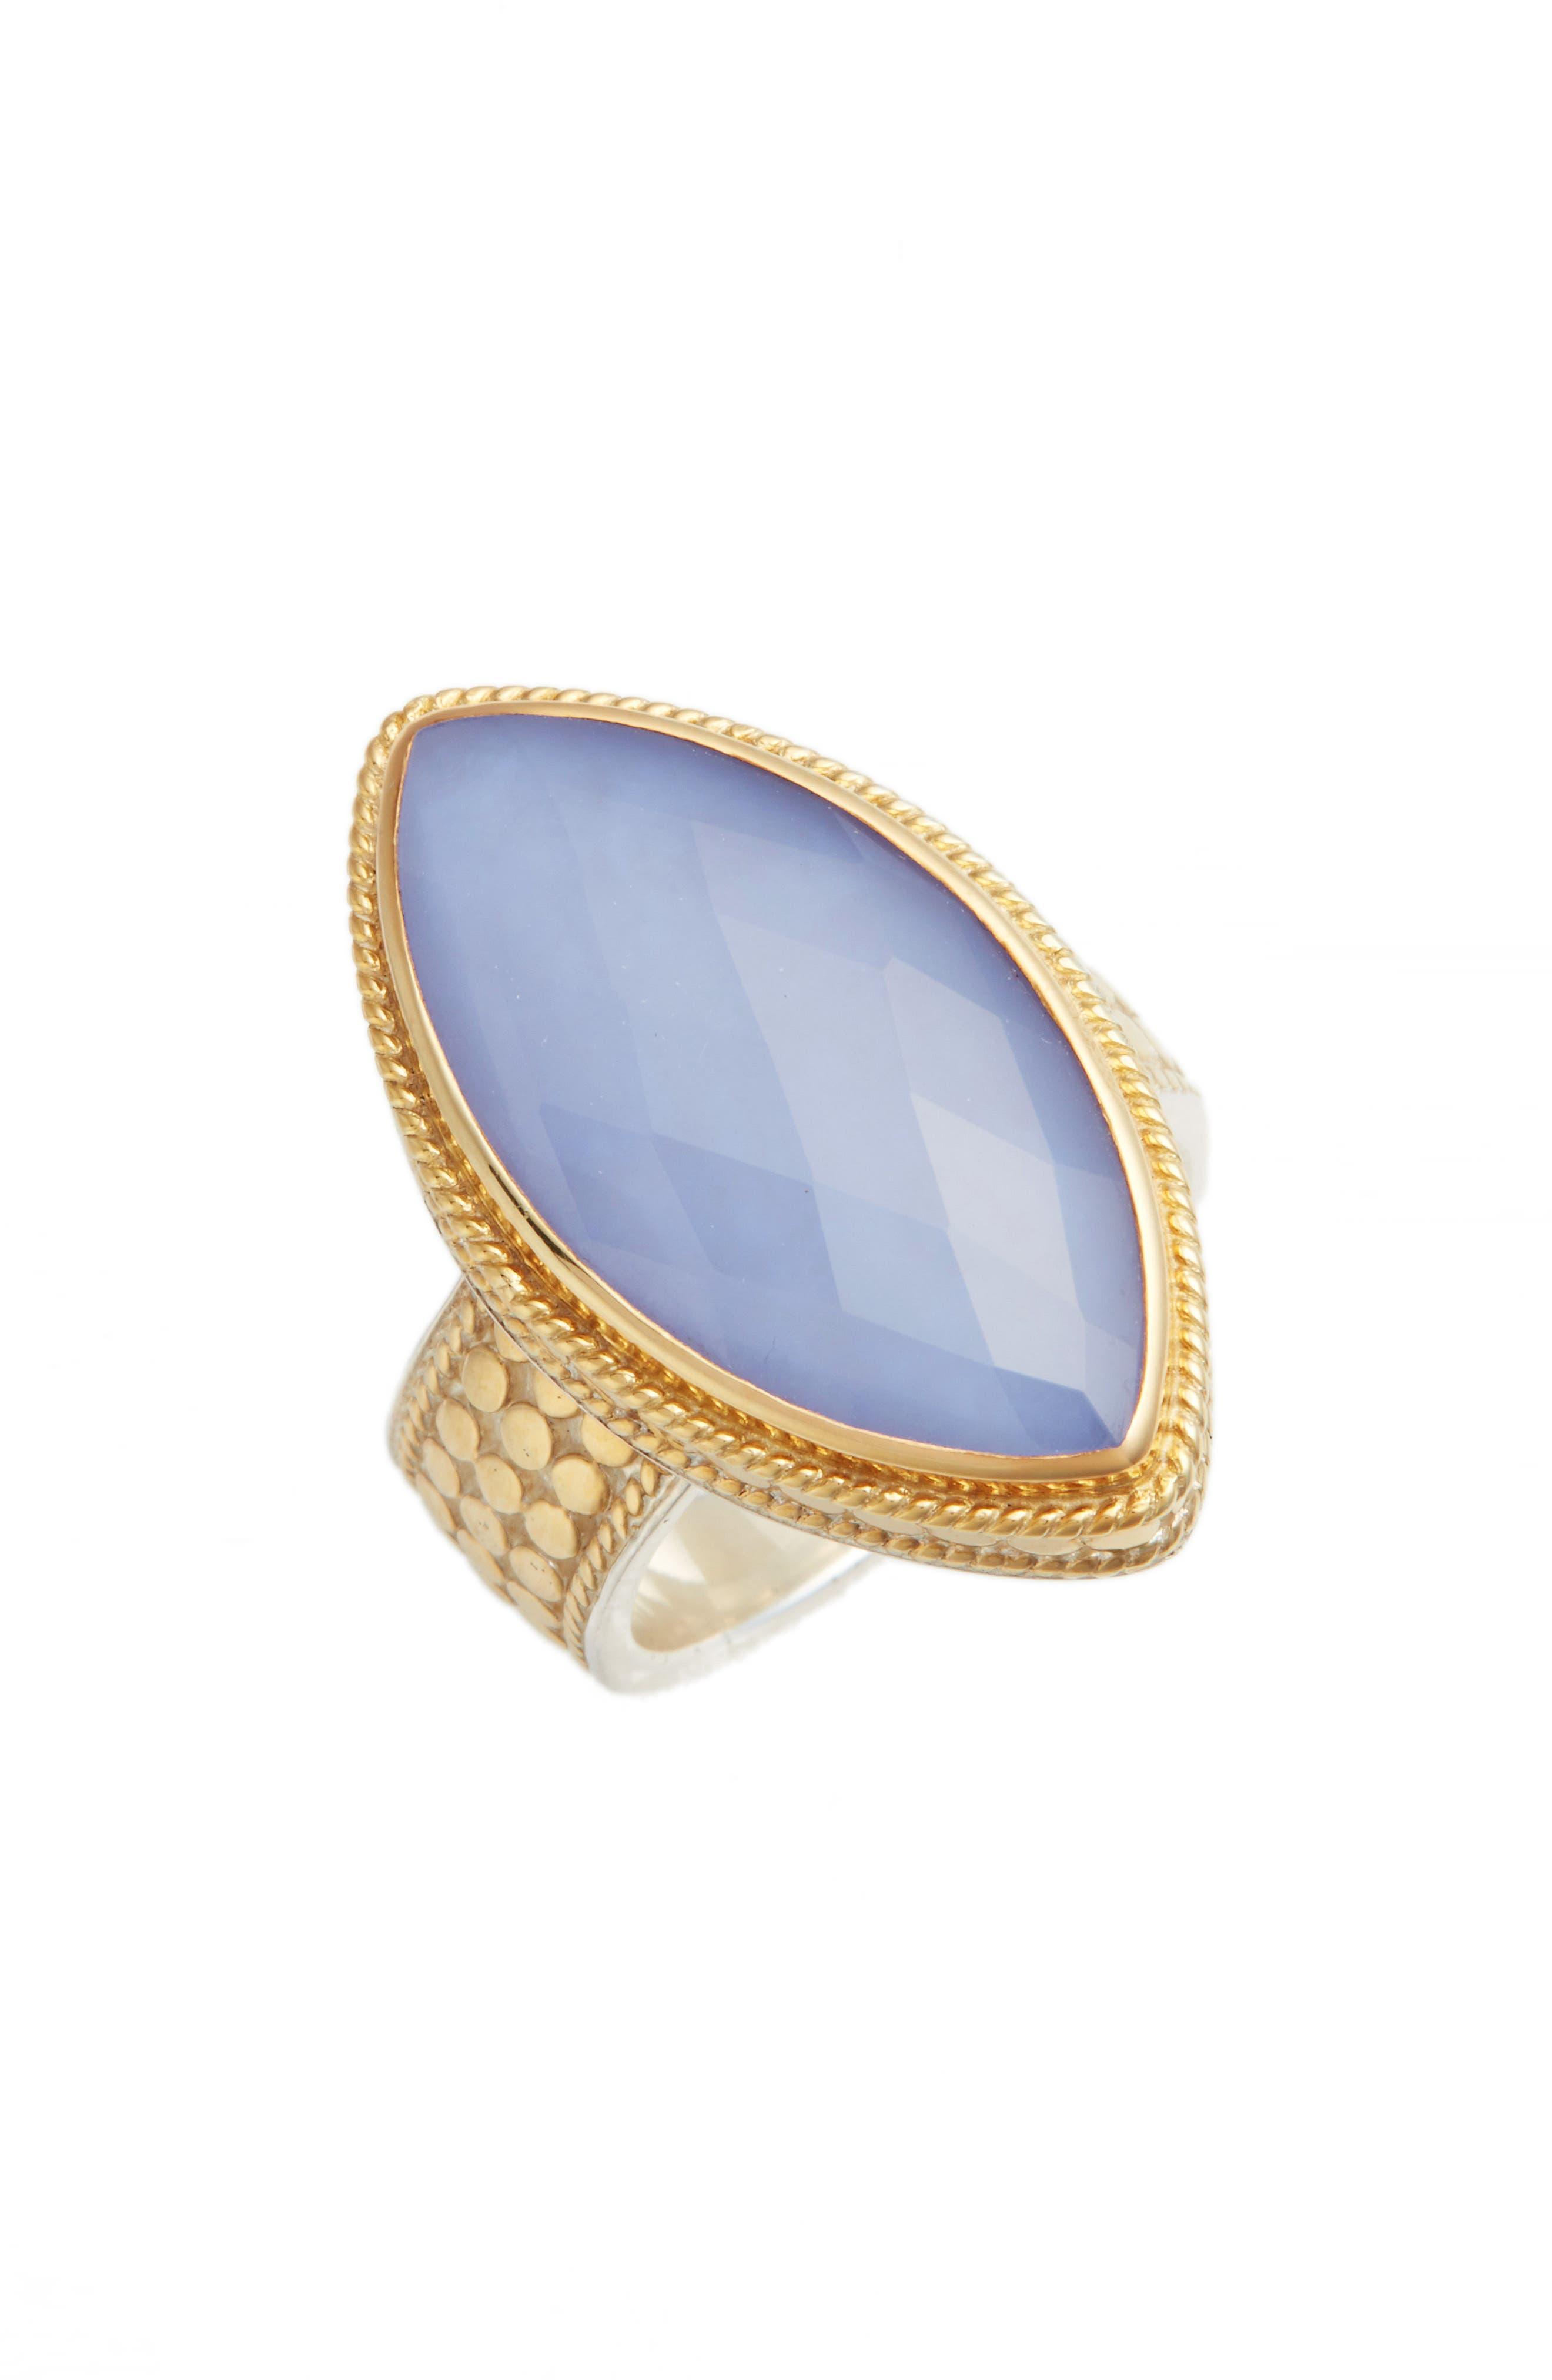 Main Image - Anna Beck Stone Ring